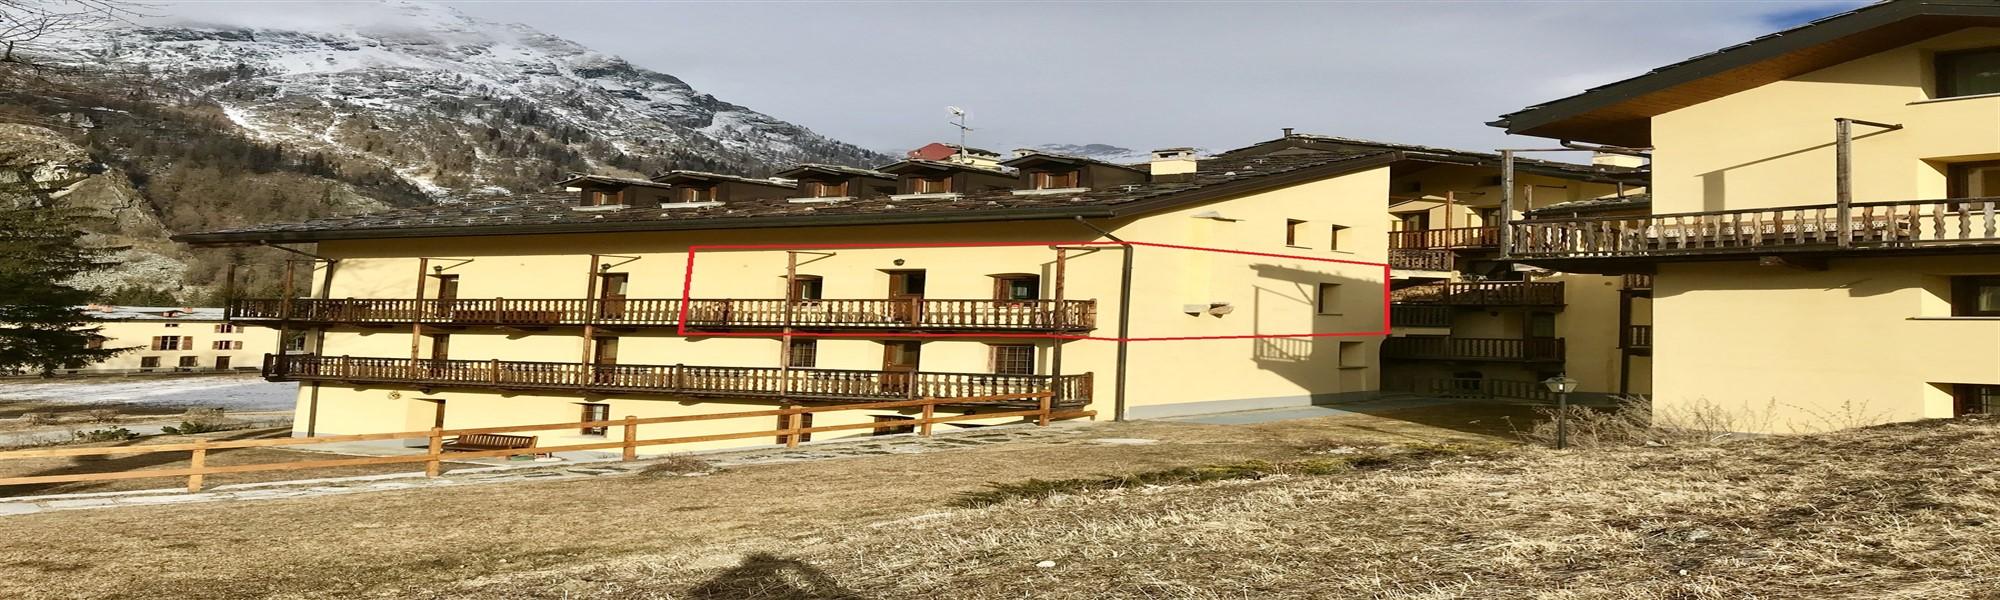 VENDITA BILOCALE IN STABILE D'EPOCA A GRESSONEY SAINT JEAN